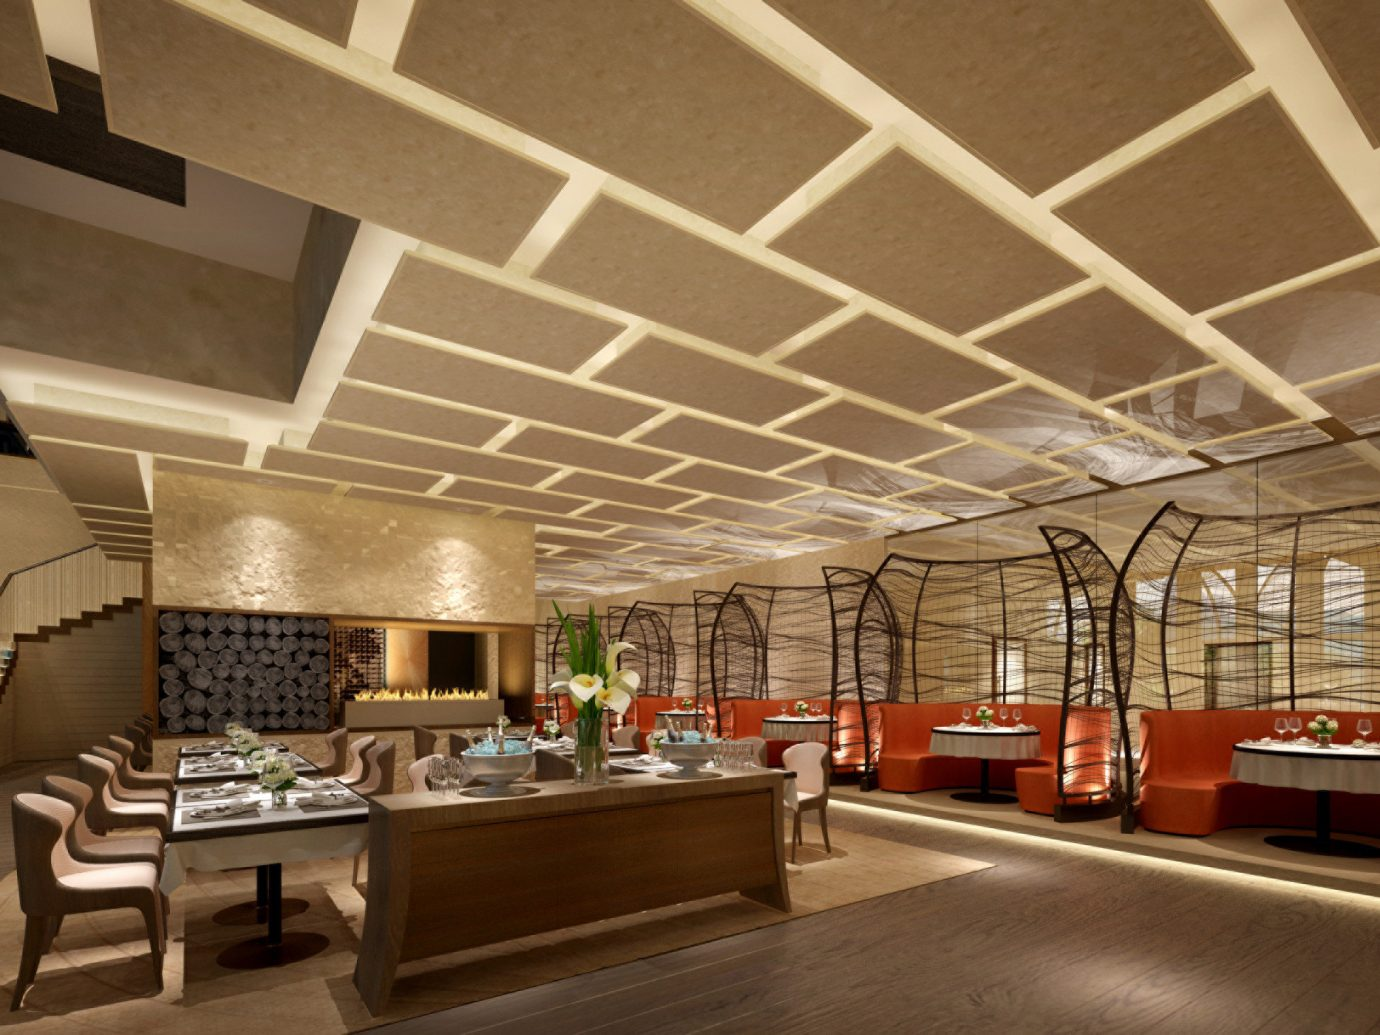 Hotels Romance indoor floor room building ceiling Architecture Lobby interior design estate lighting Design window covering area furniture